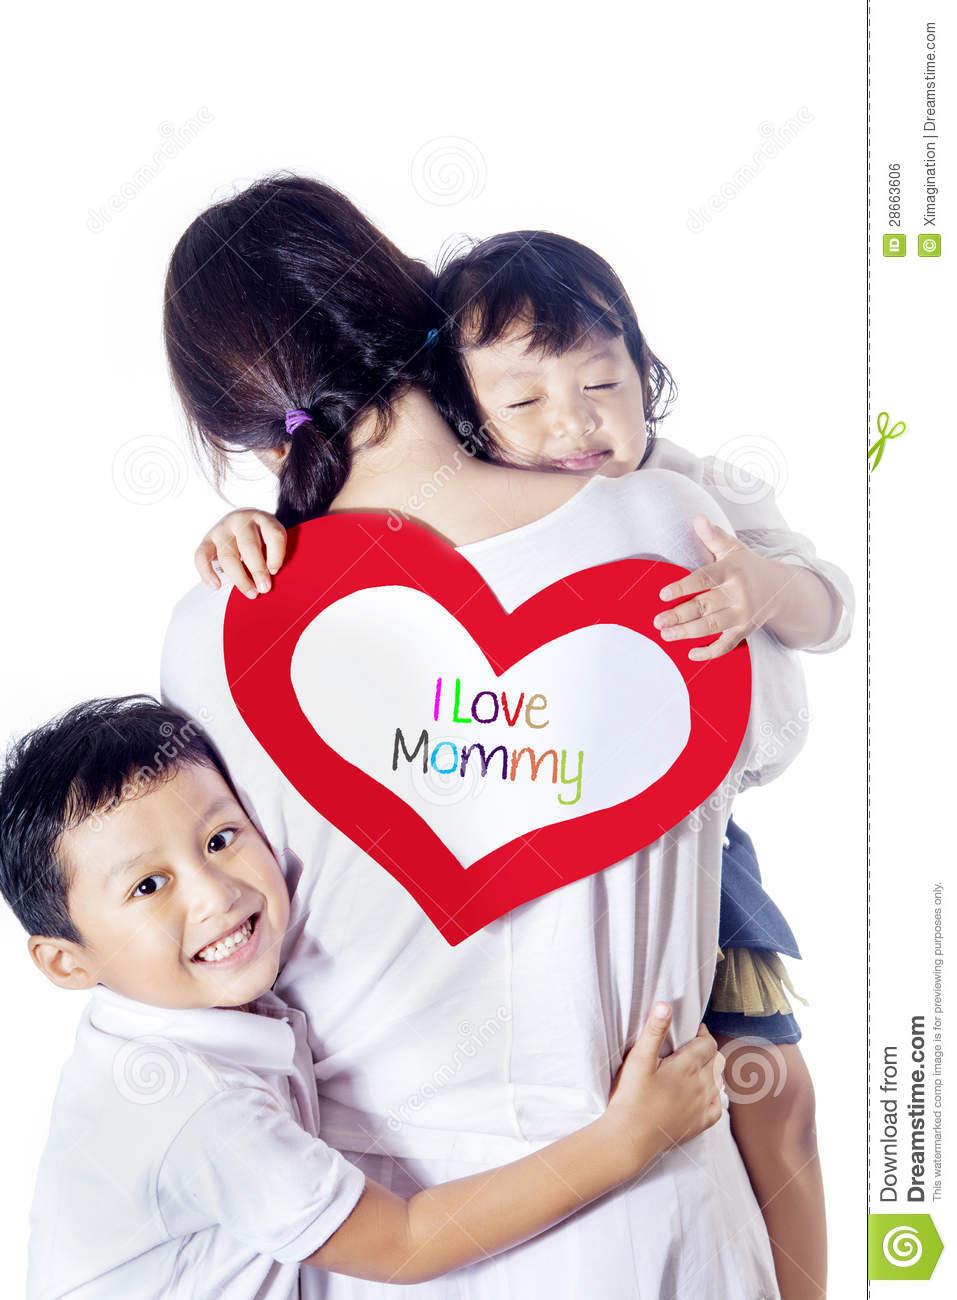 single-mom-i love mommy.jpg